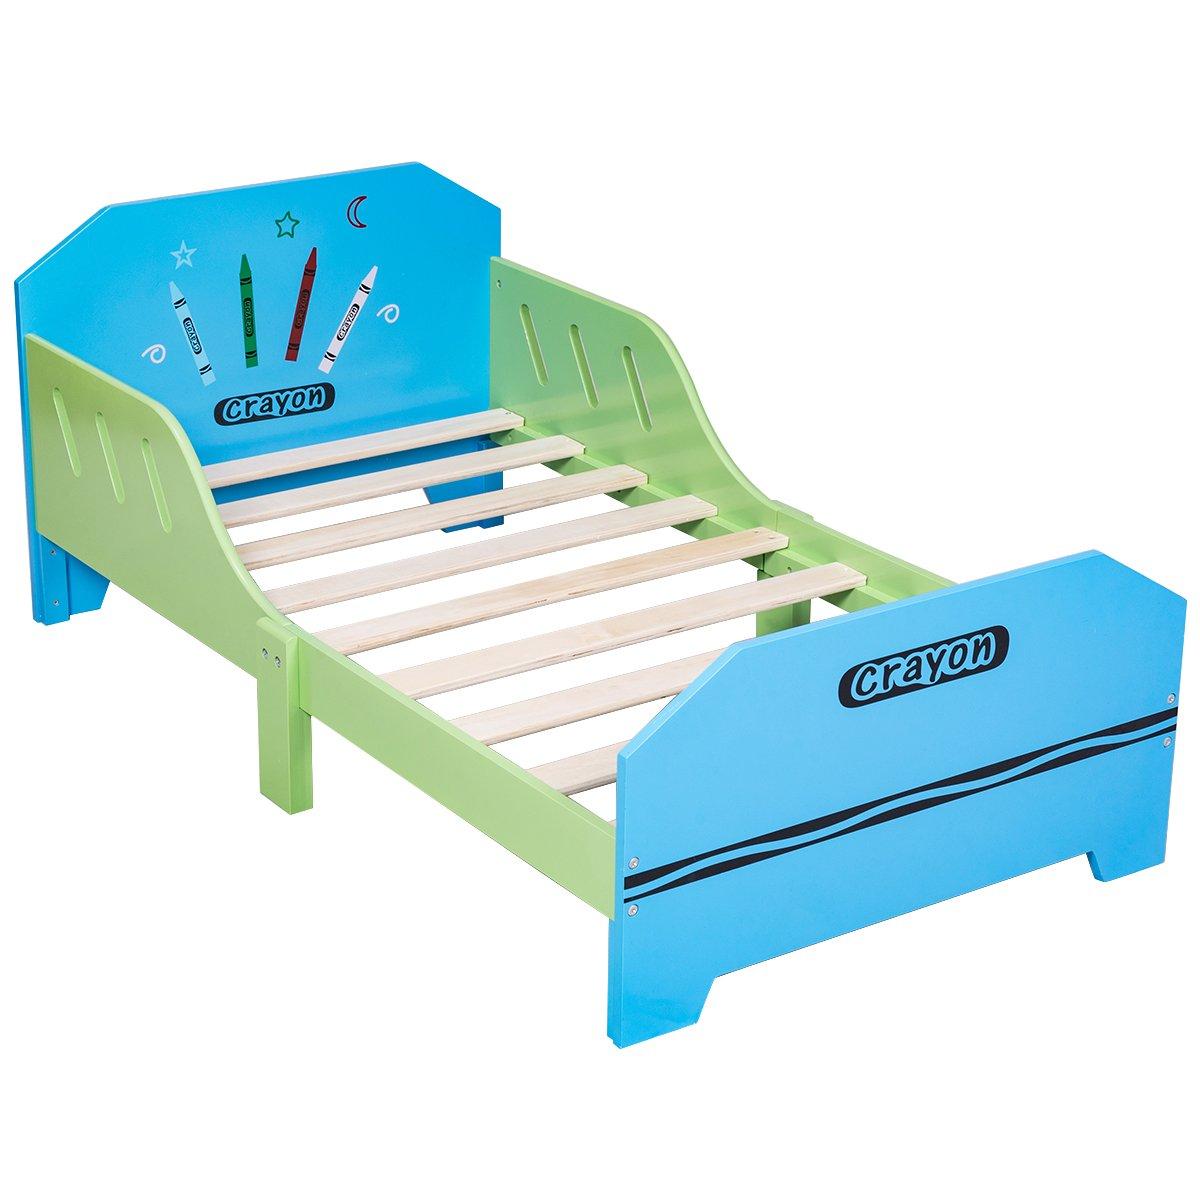 COSTWAY Kinderbett Jugendbett Bettliege Bettgestell Holz Bett Spielbett Kindermöbel Lattenrost 70 x 140 cm